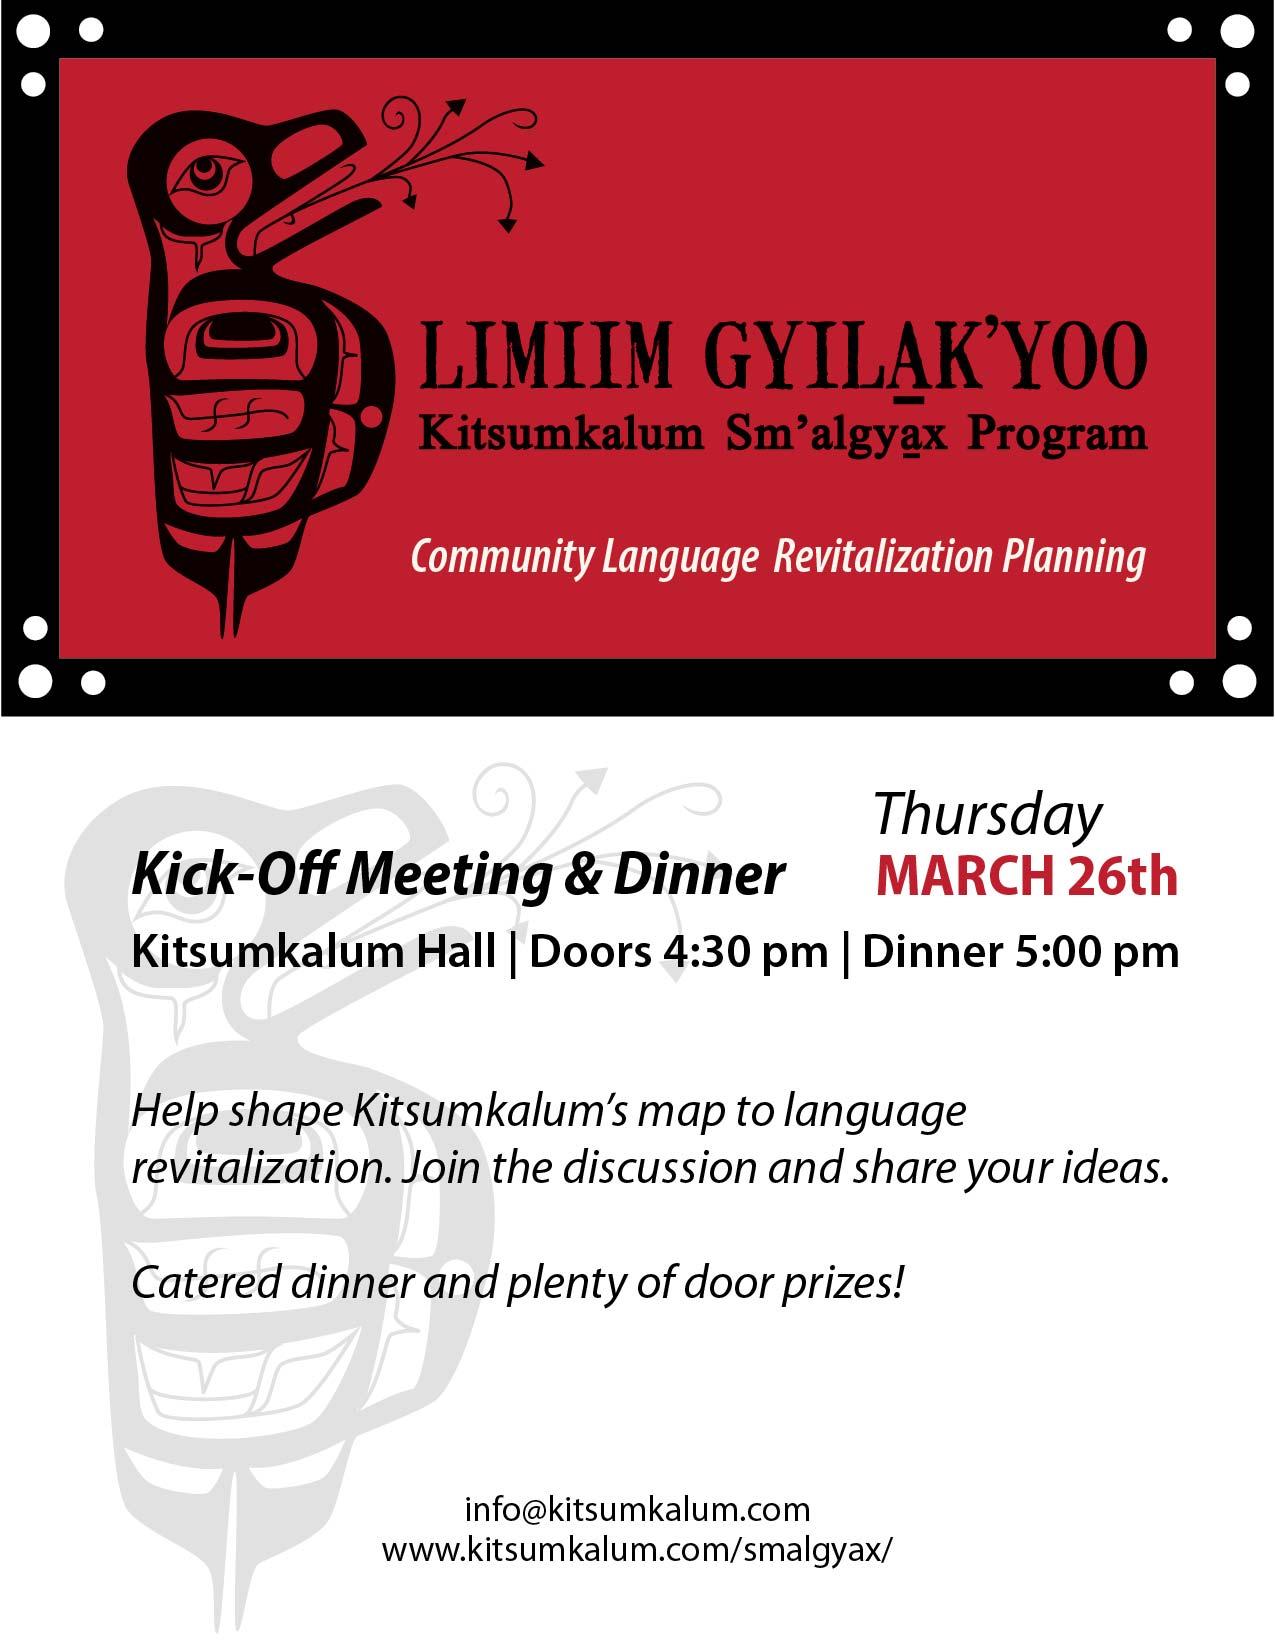 POSTPONED Community Language Revitalization Planning March 26